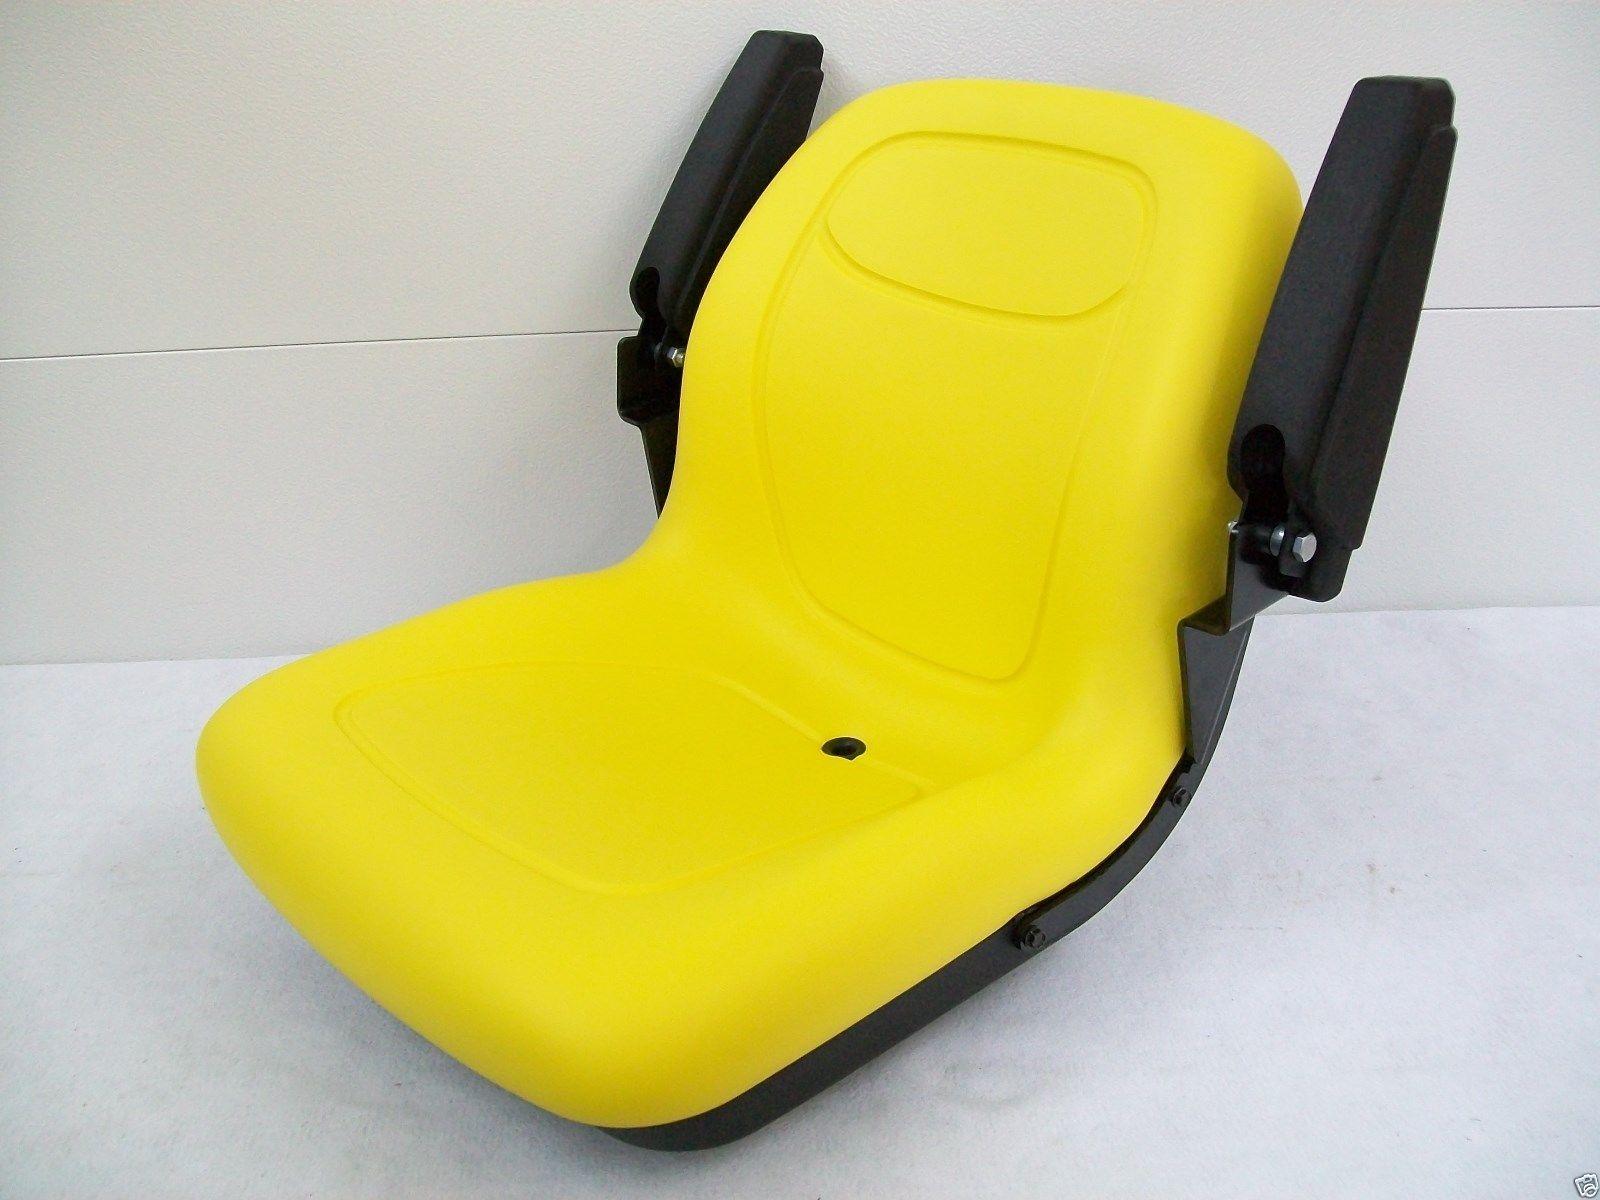 John Deere Tractor Seat : Seat john deere gx lx